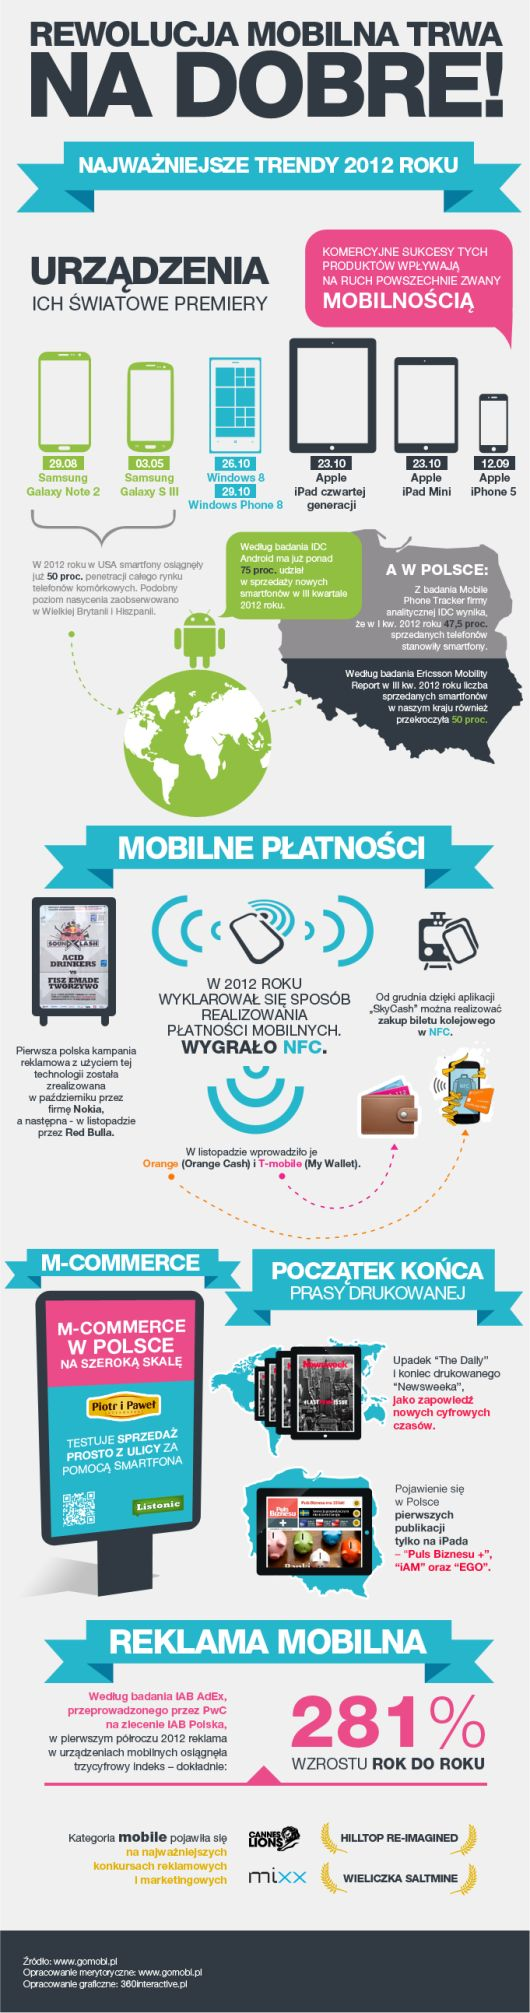 2012: rewolucja mobilna